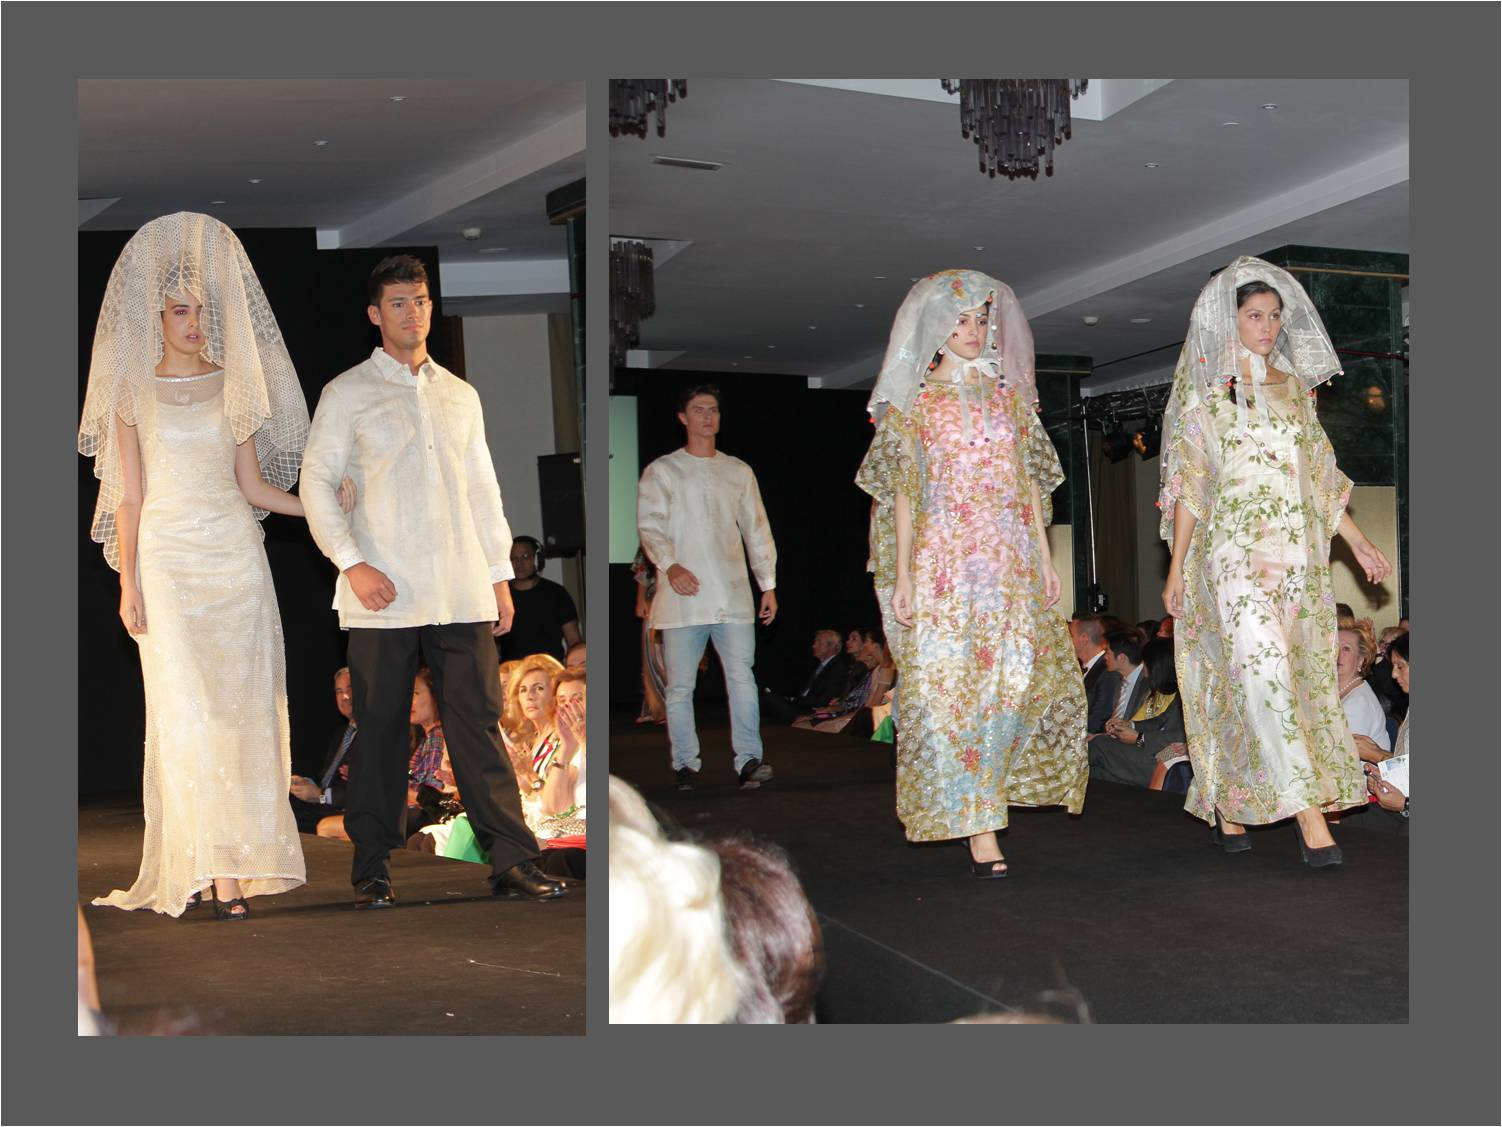 Pina Design the philippine embassy in madrid brings in piña design masterpieces